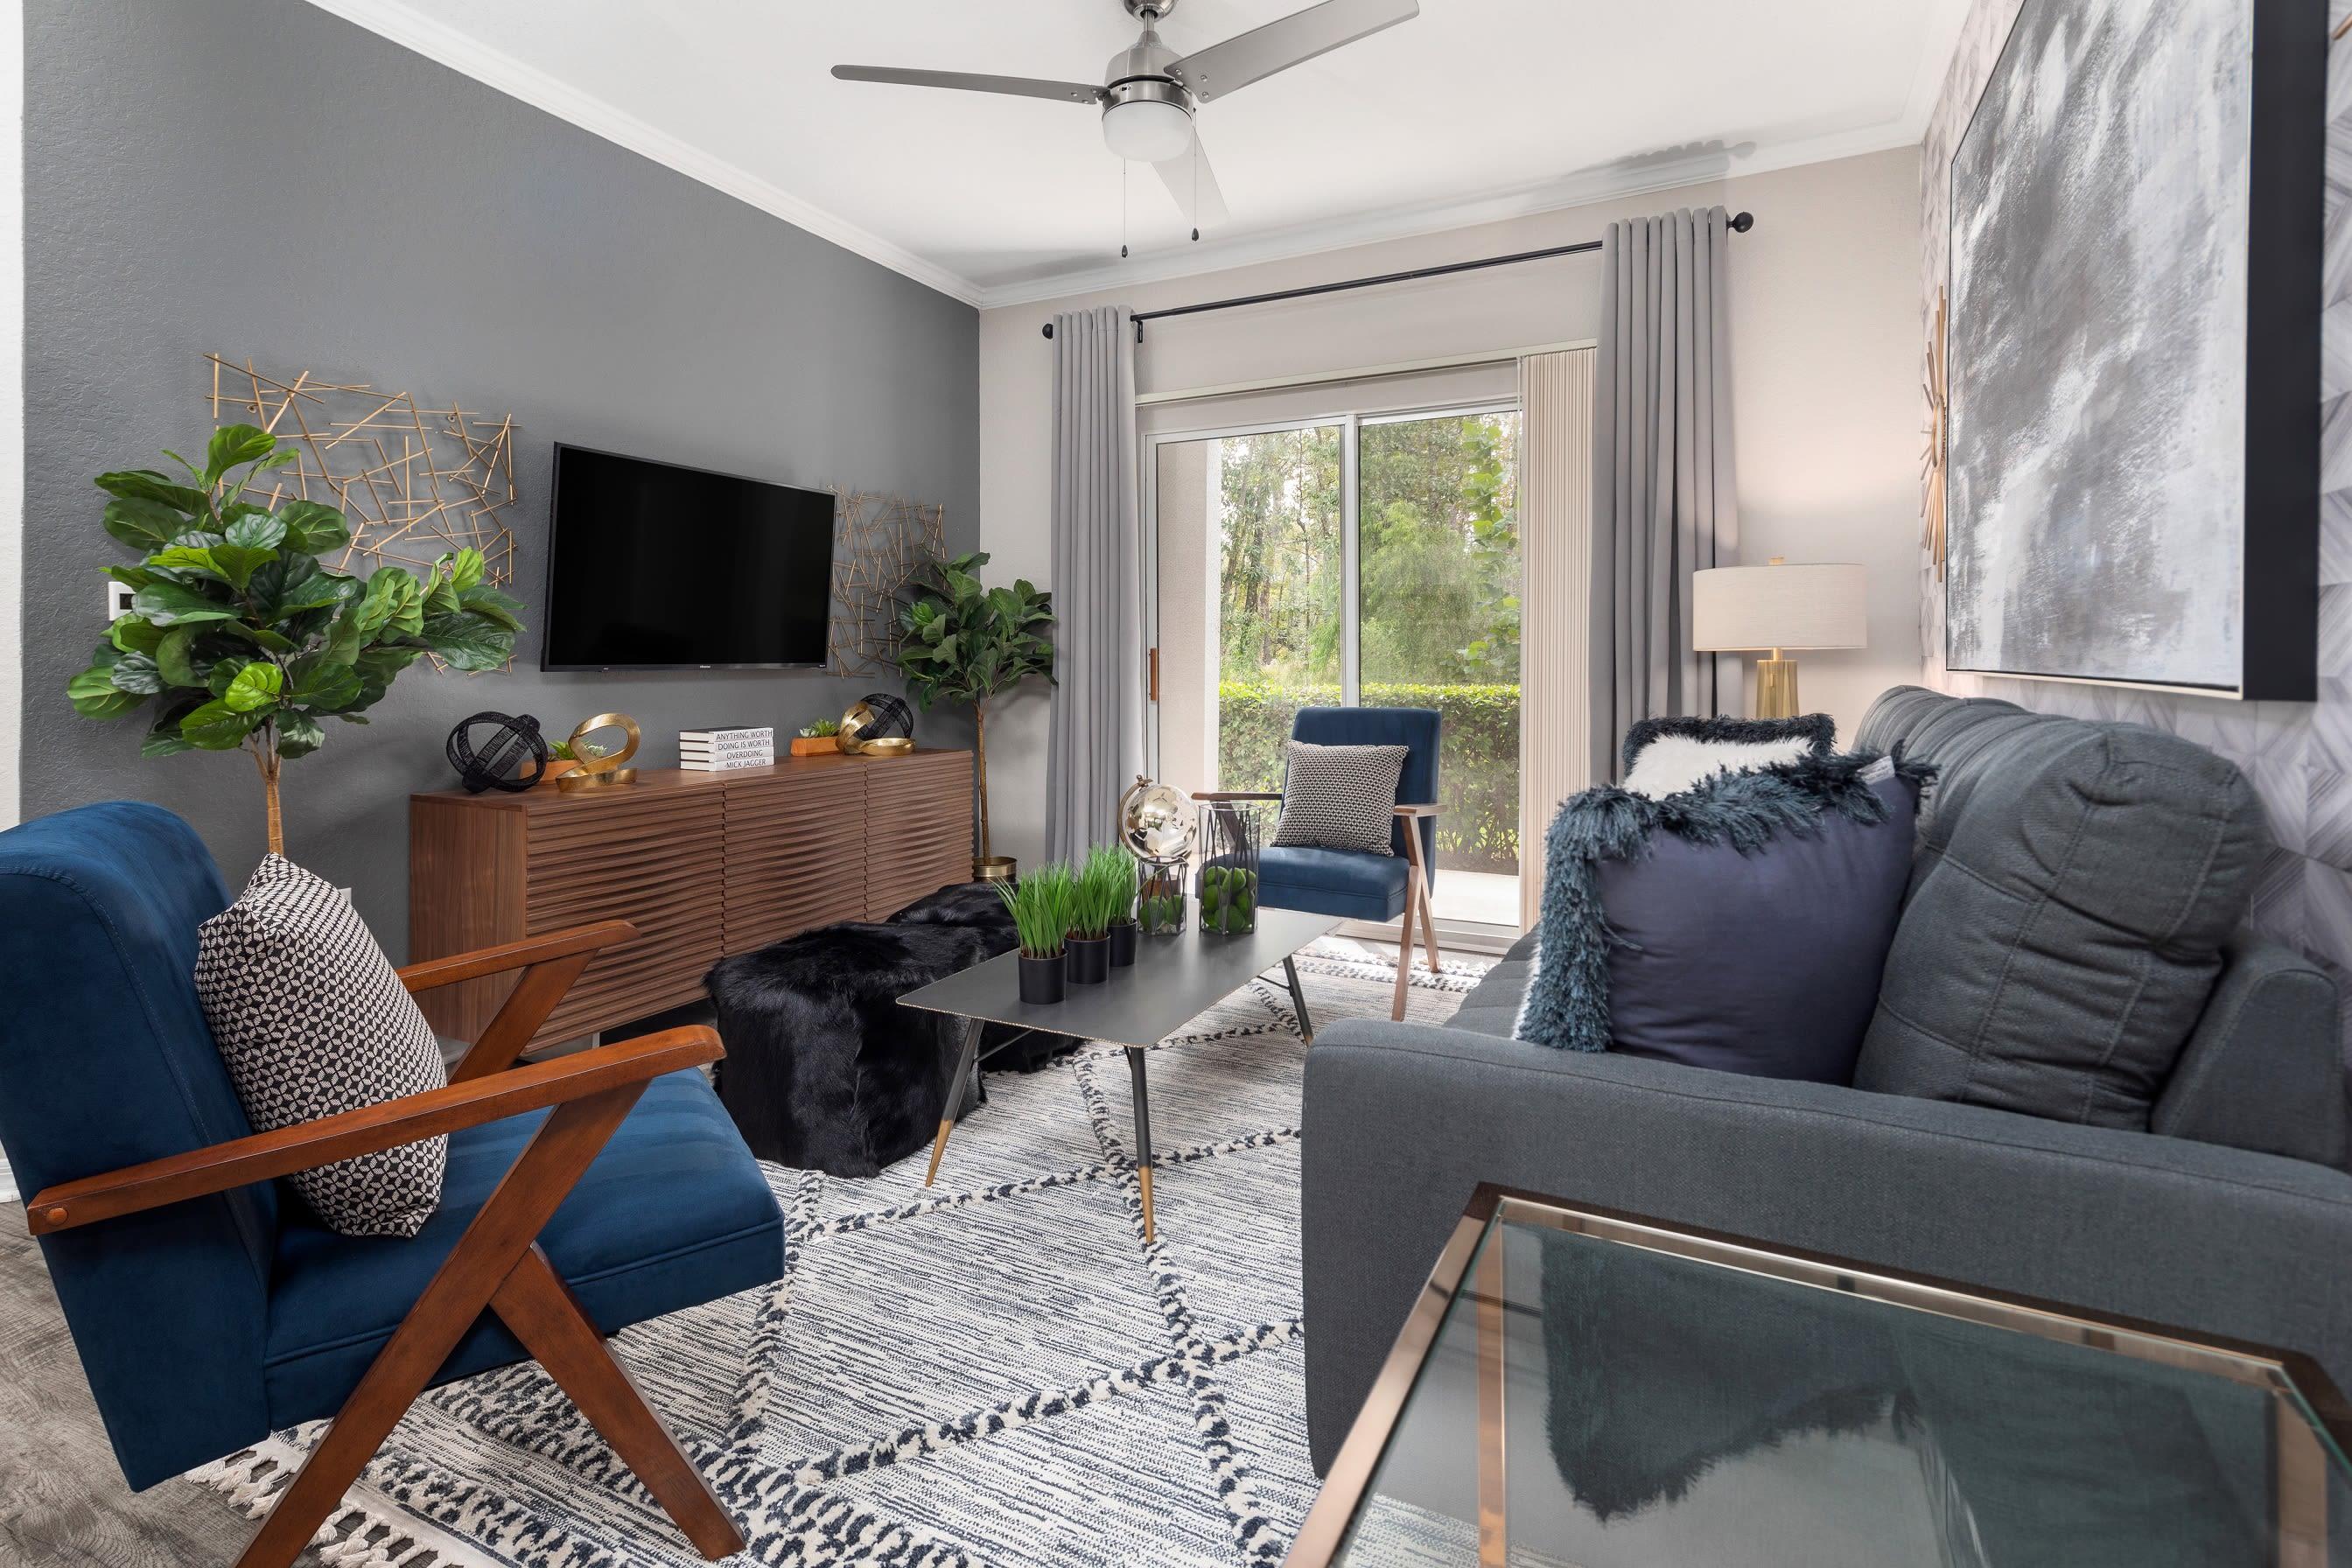 Modern decor in model living room at Mezza in Jacksonville, Florida